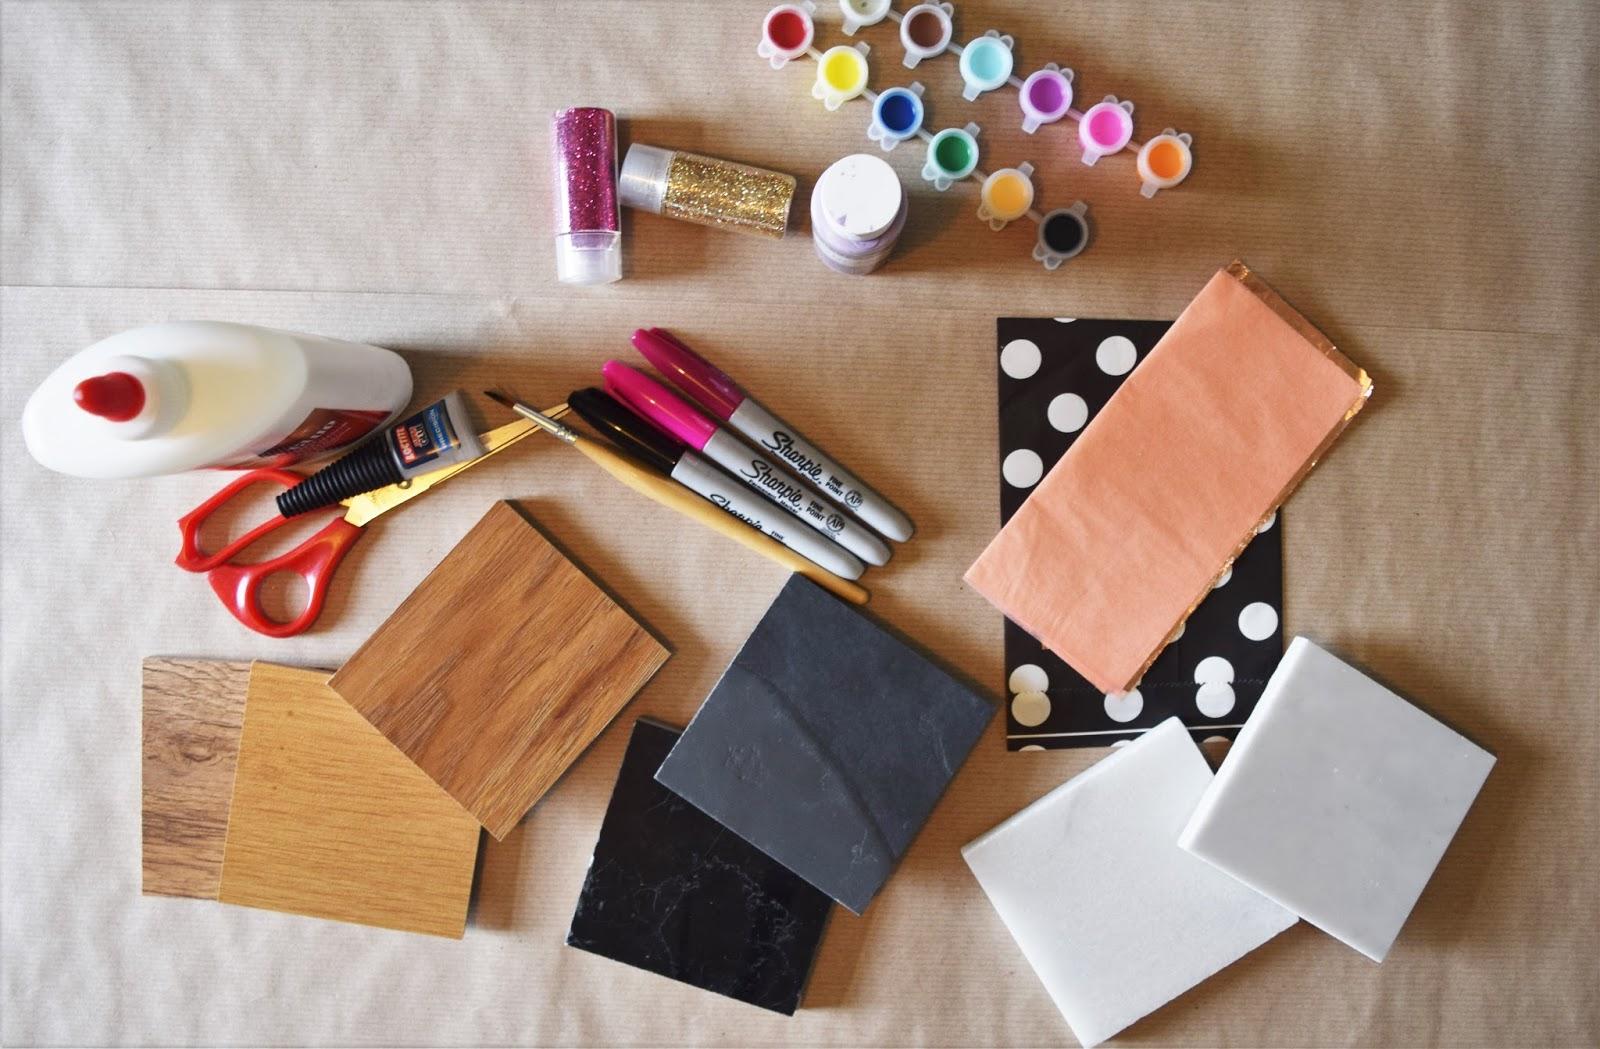 DIY FLOORING SAMPLE COASTERS - A Life With Frills